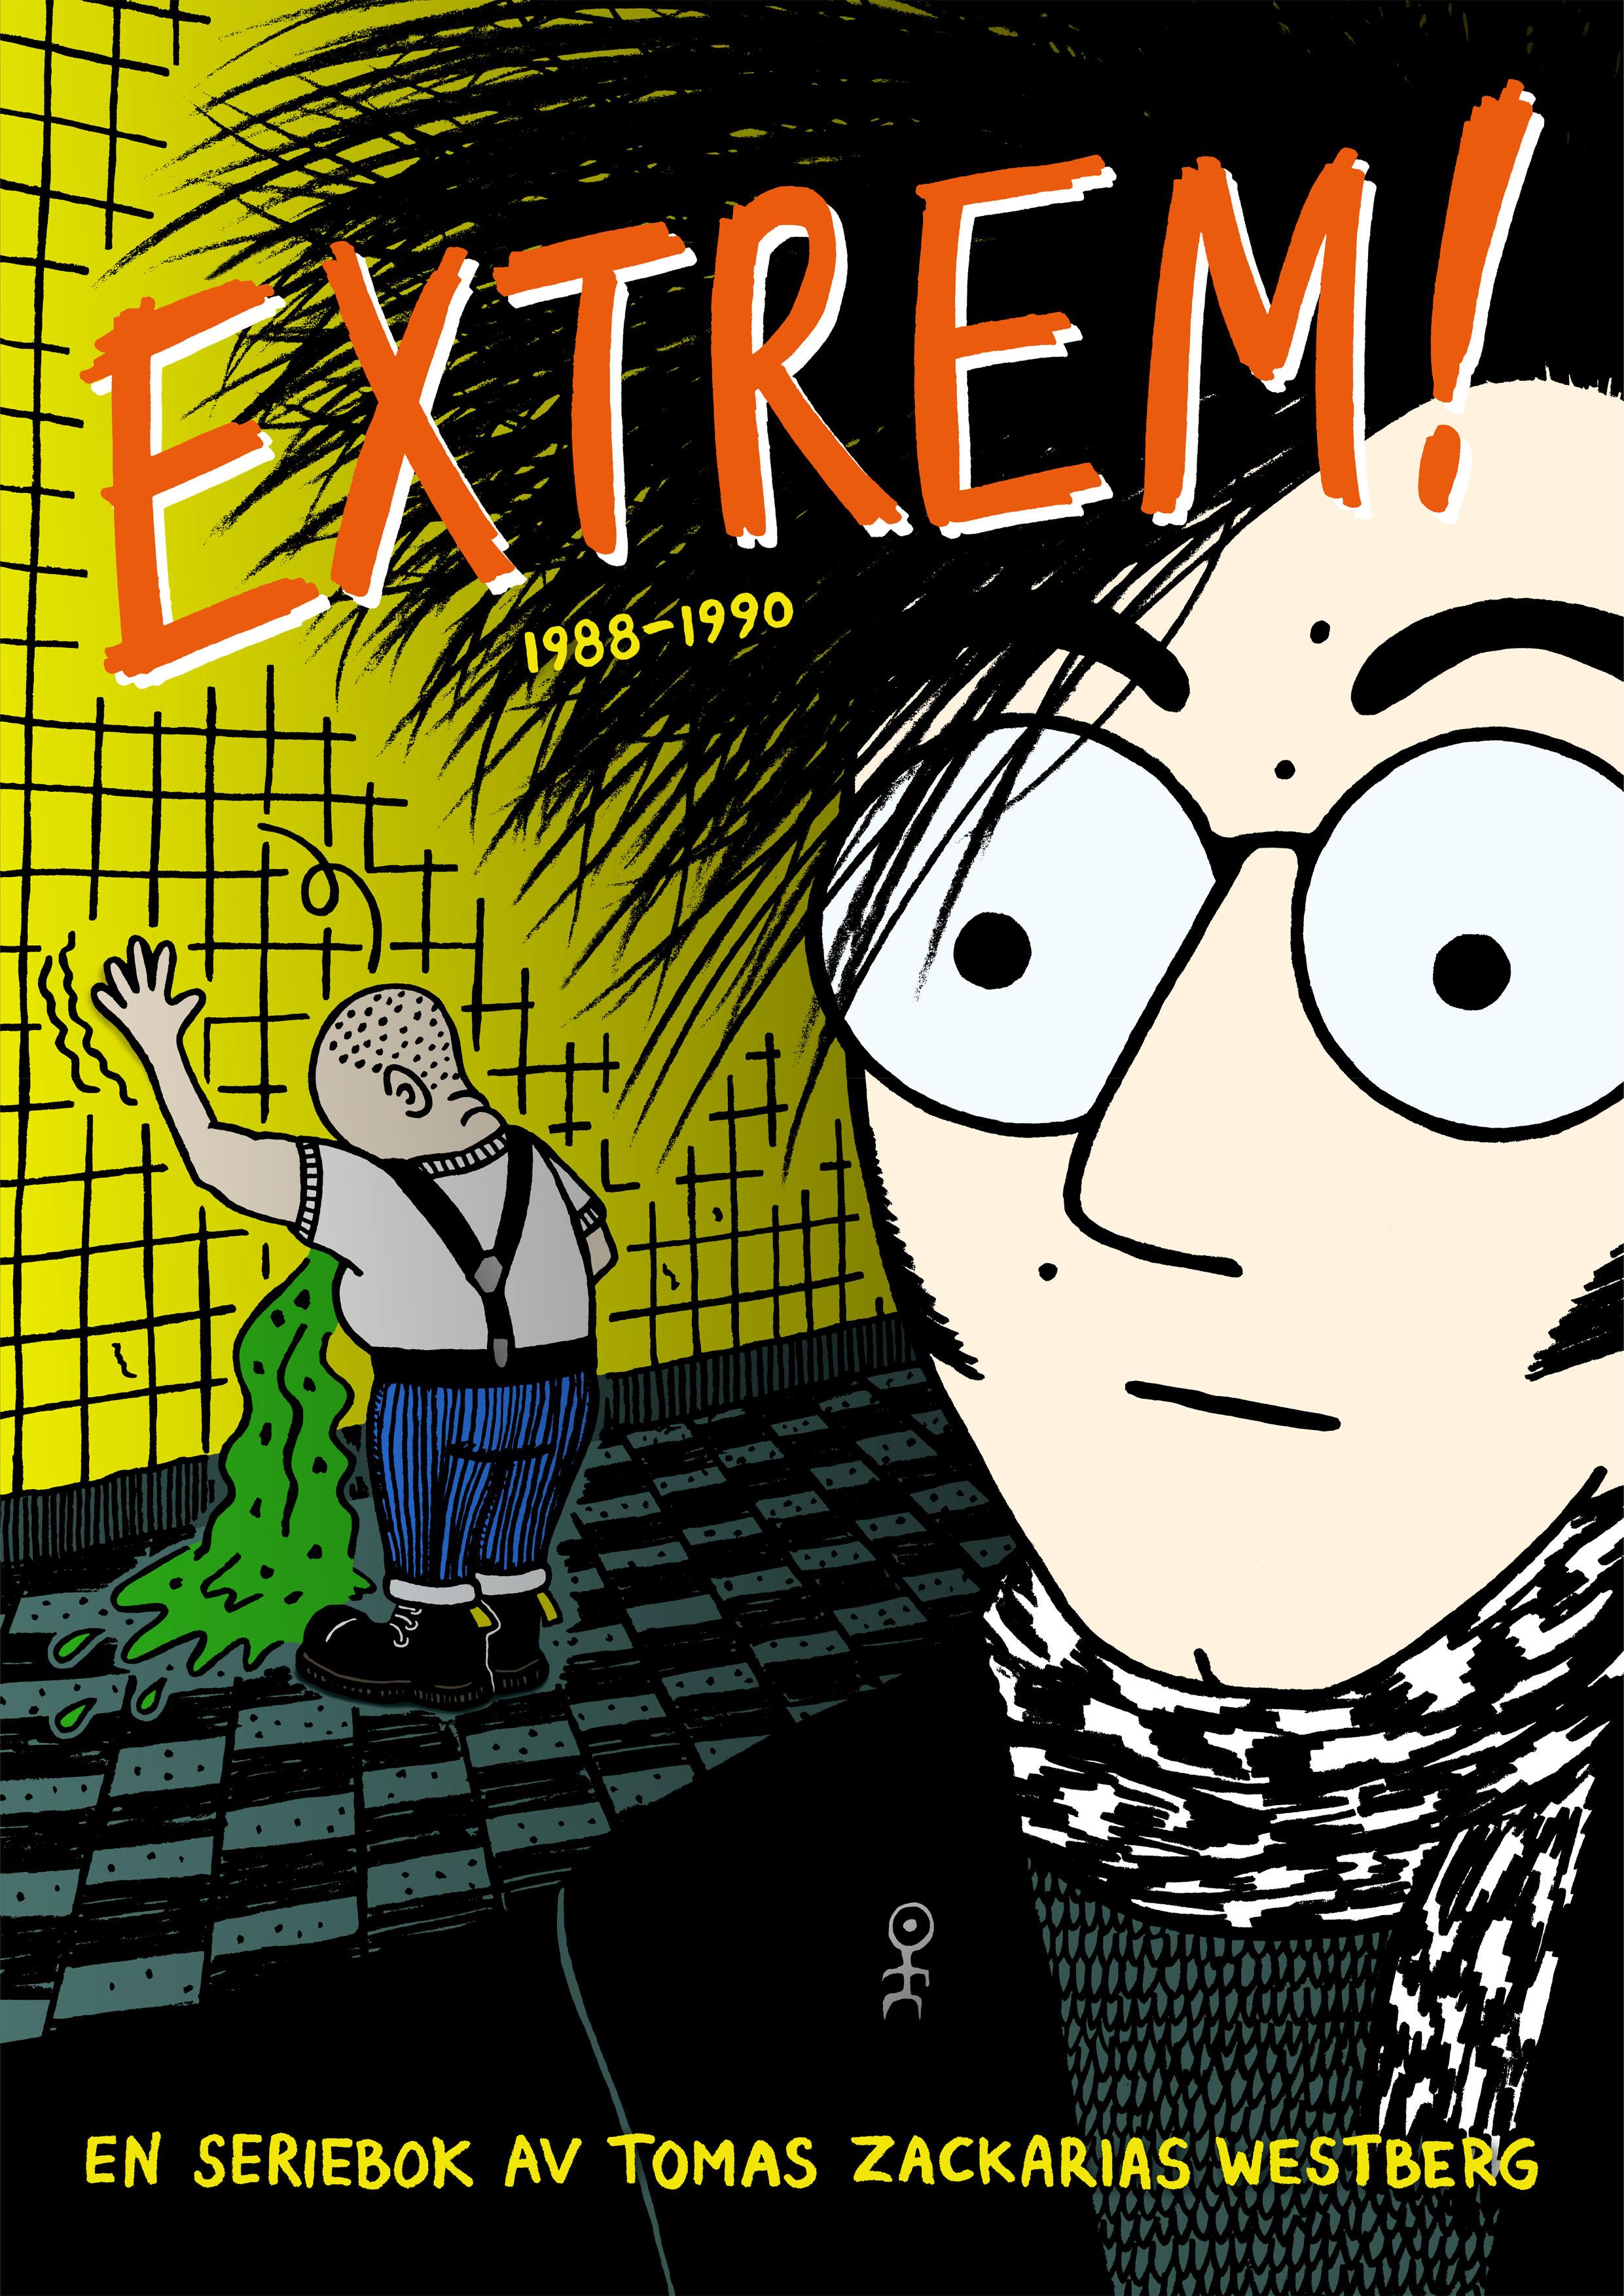 Extrem! 1988-1990